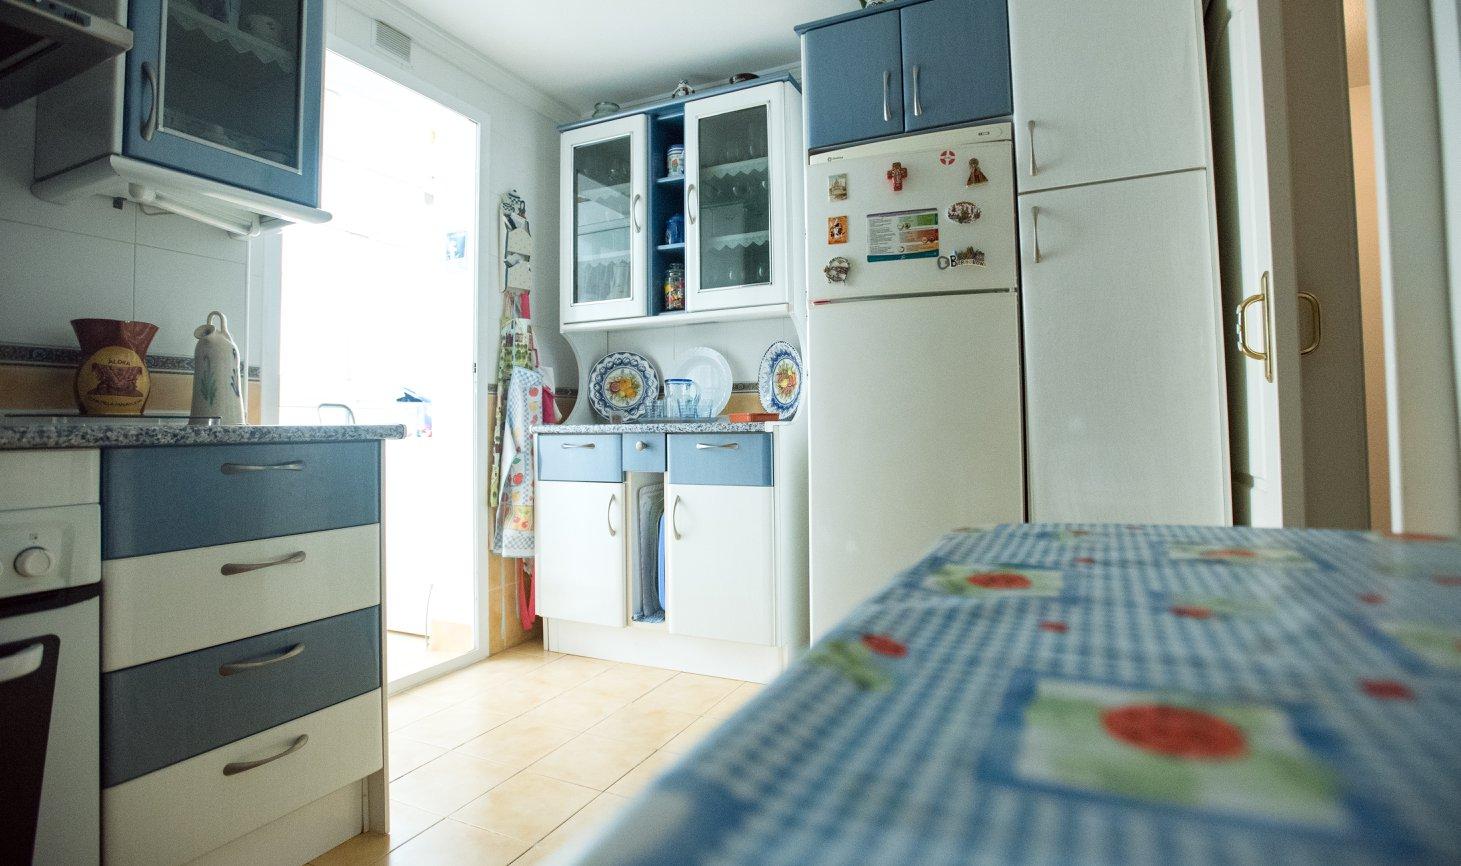 Espectacular Vivienda En Benalm Dena M10 Real Estate # Muebles Malaga Nostrum